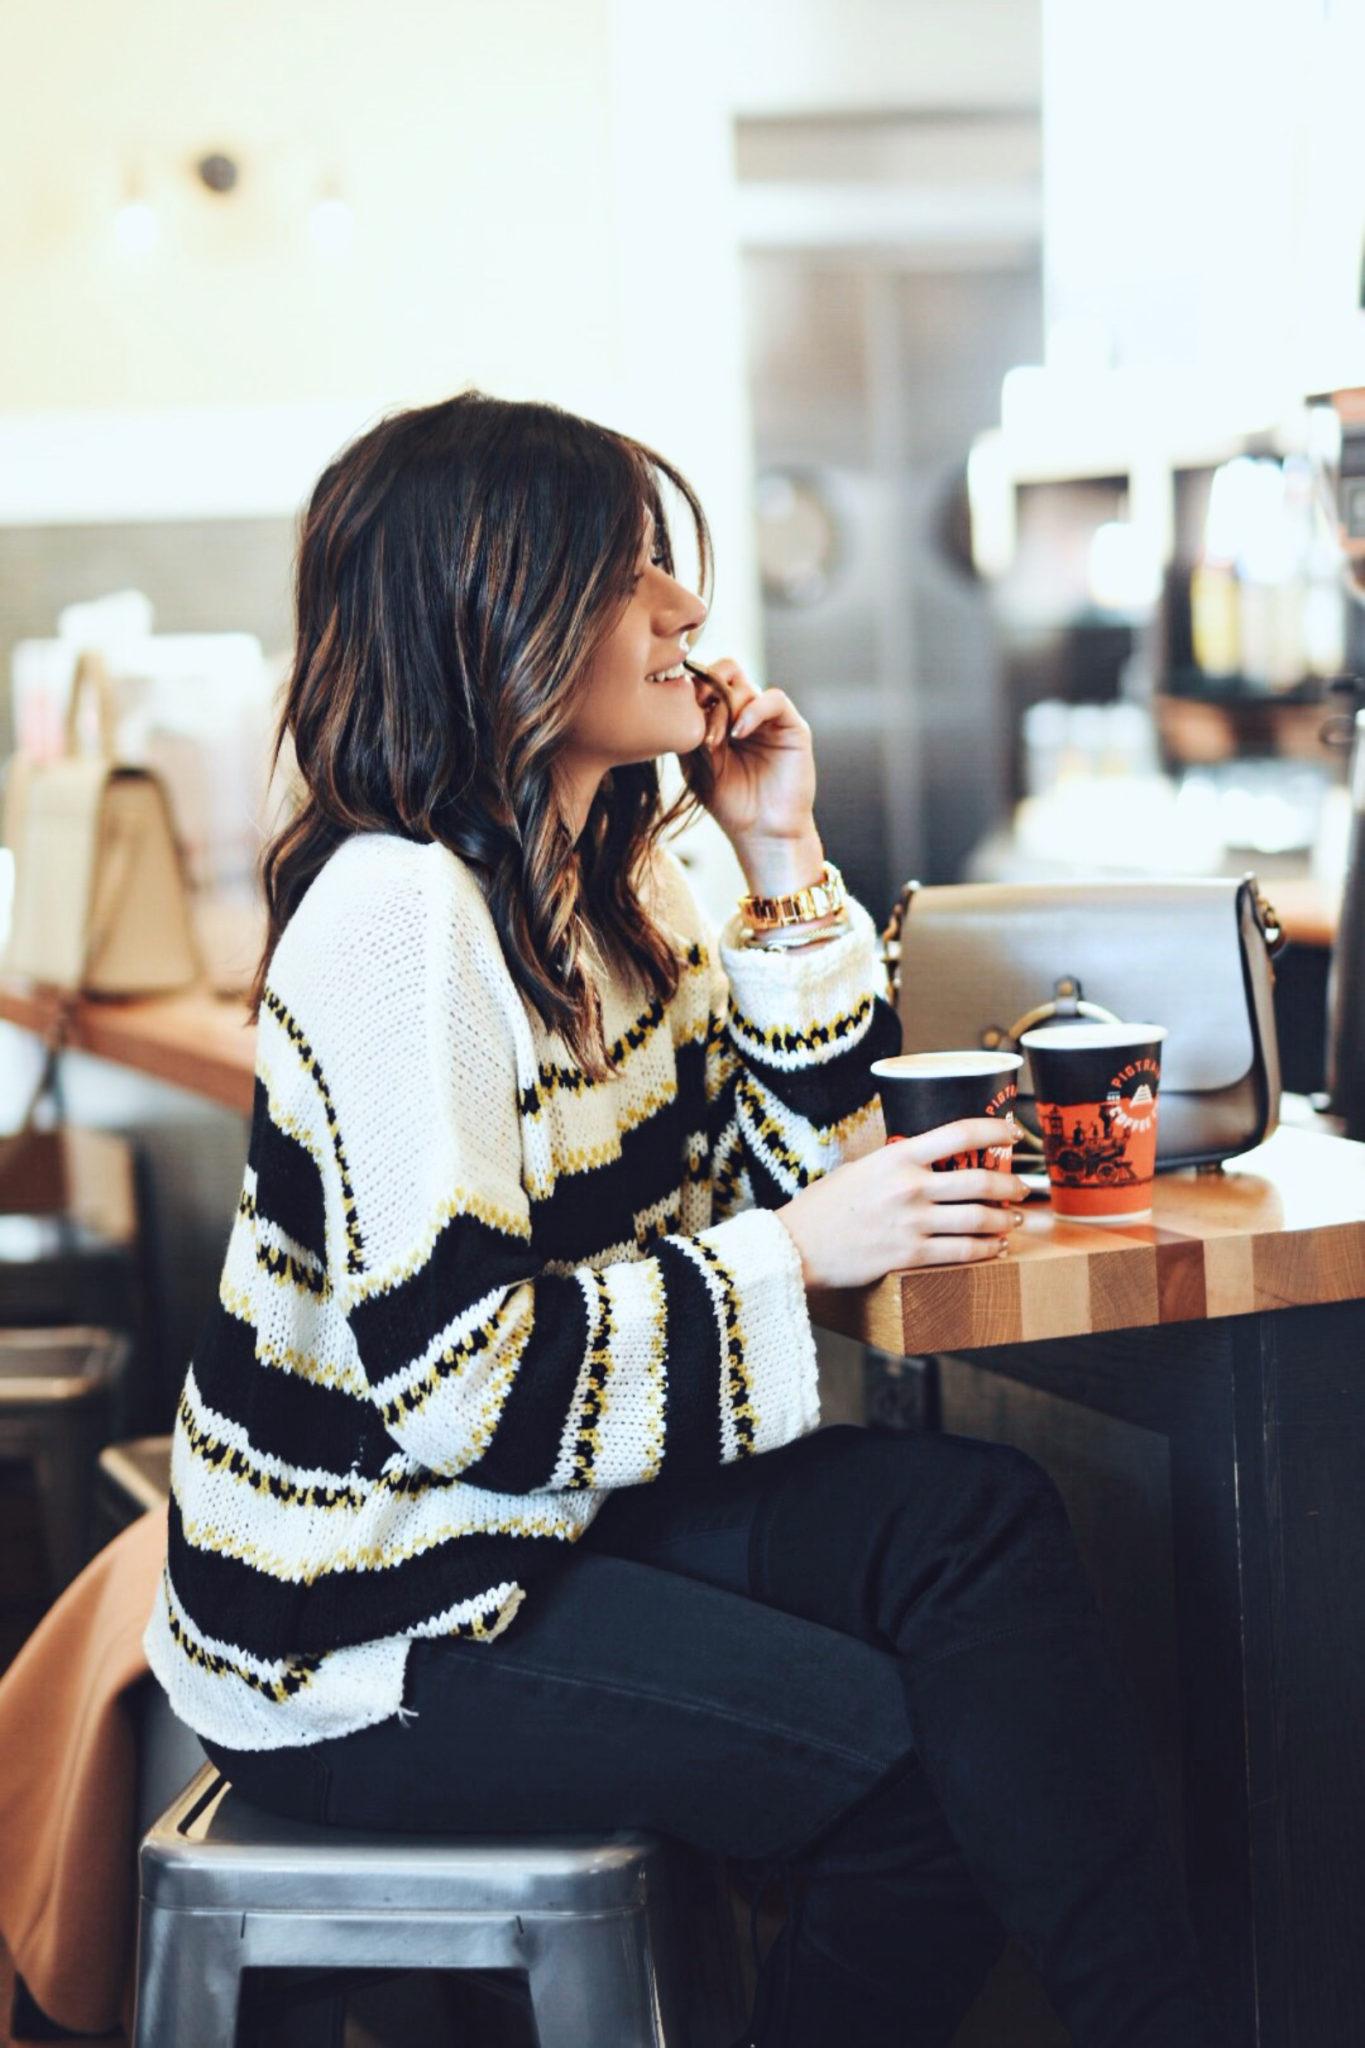 Carolina Hellal enjoying a cup of coffee at PigTrain Coffee